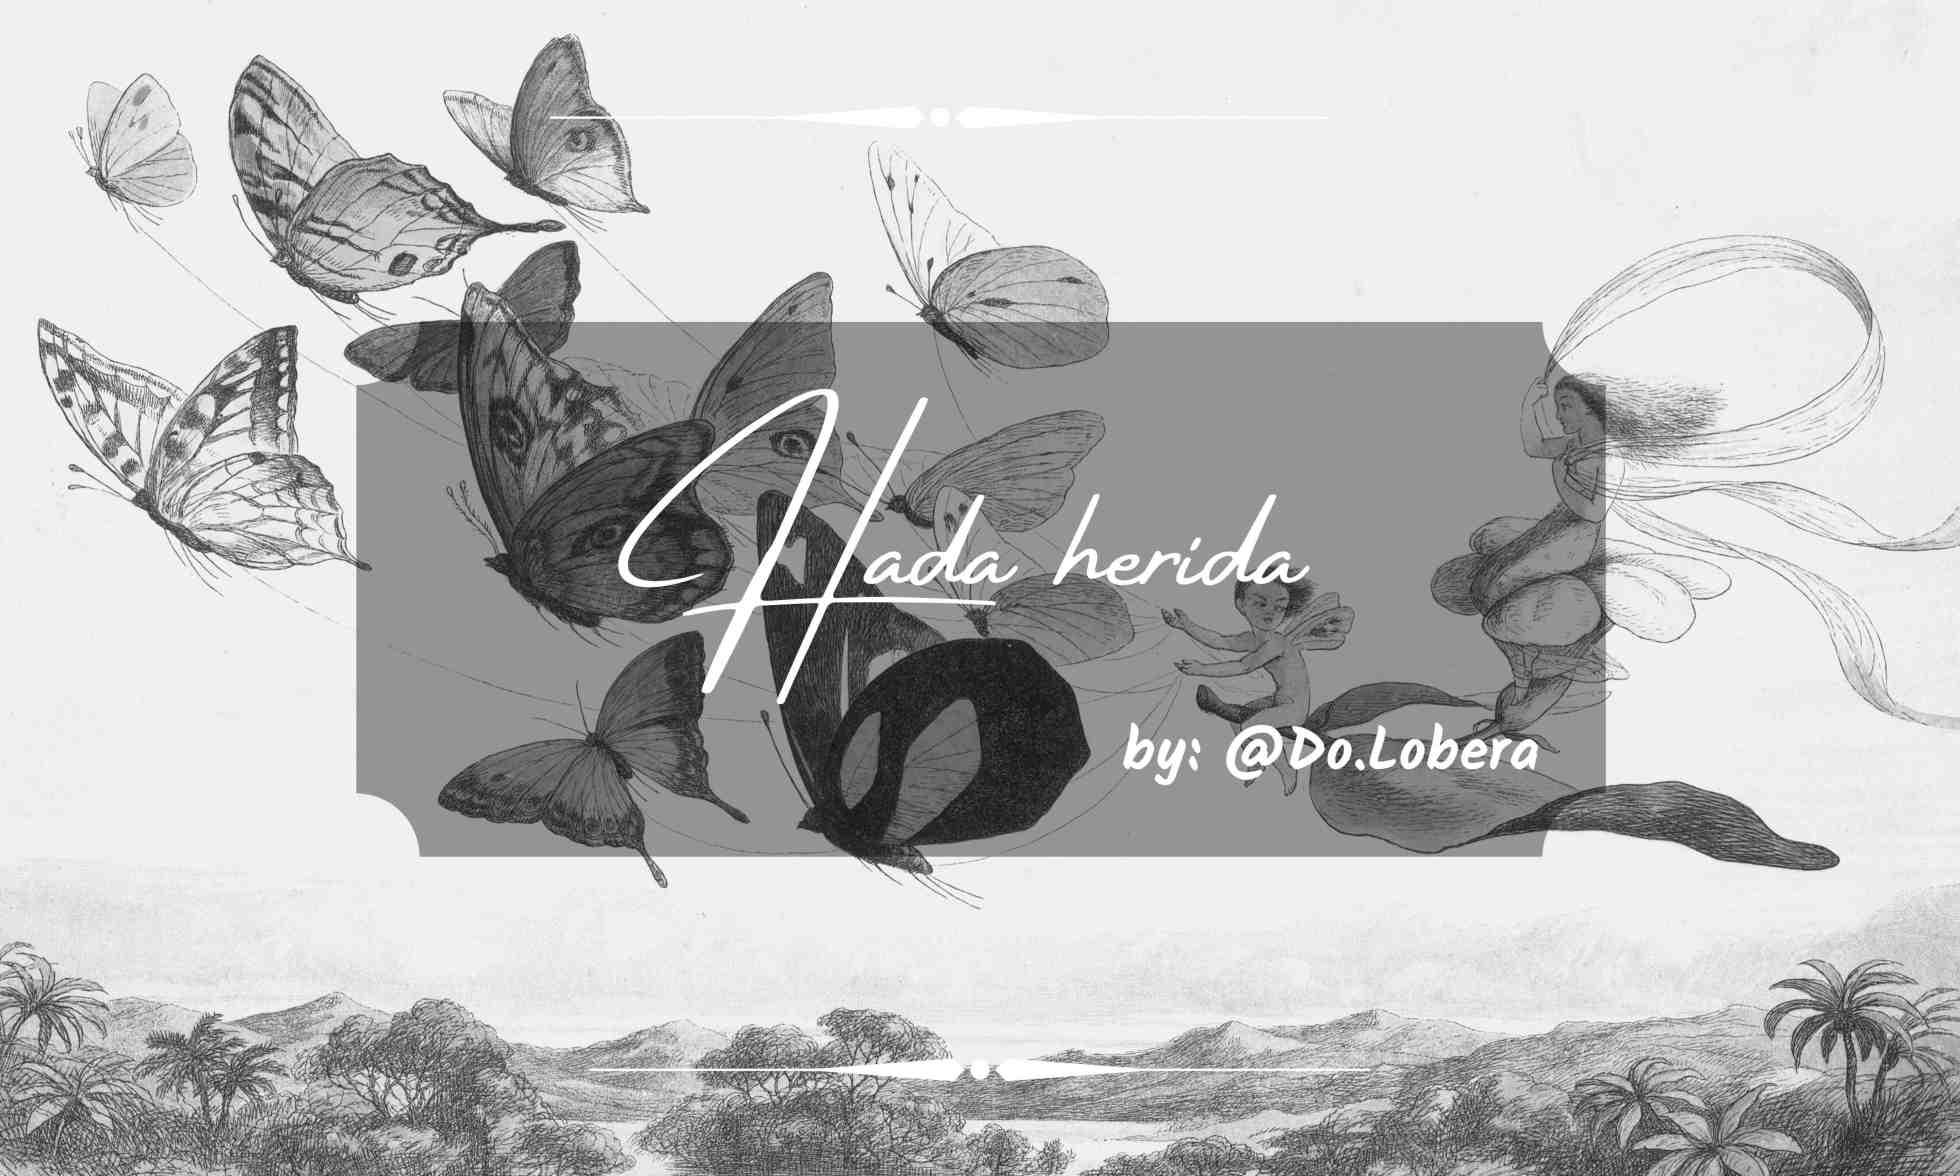 Hada herida - by Do.lobera